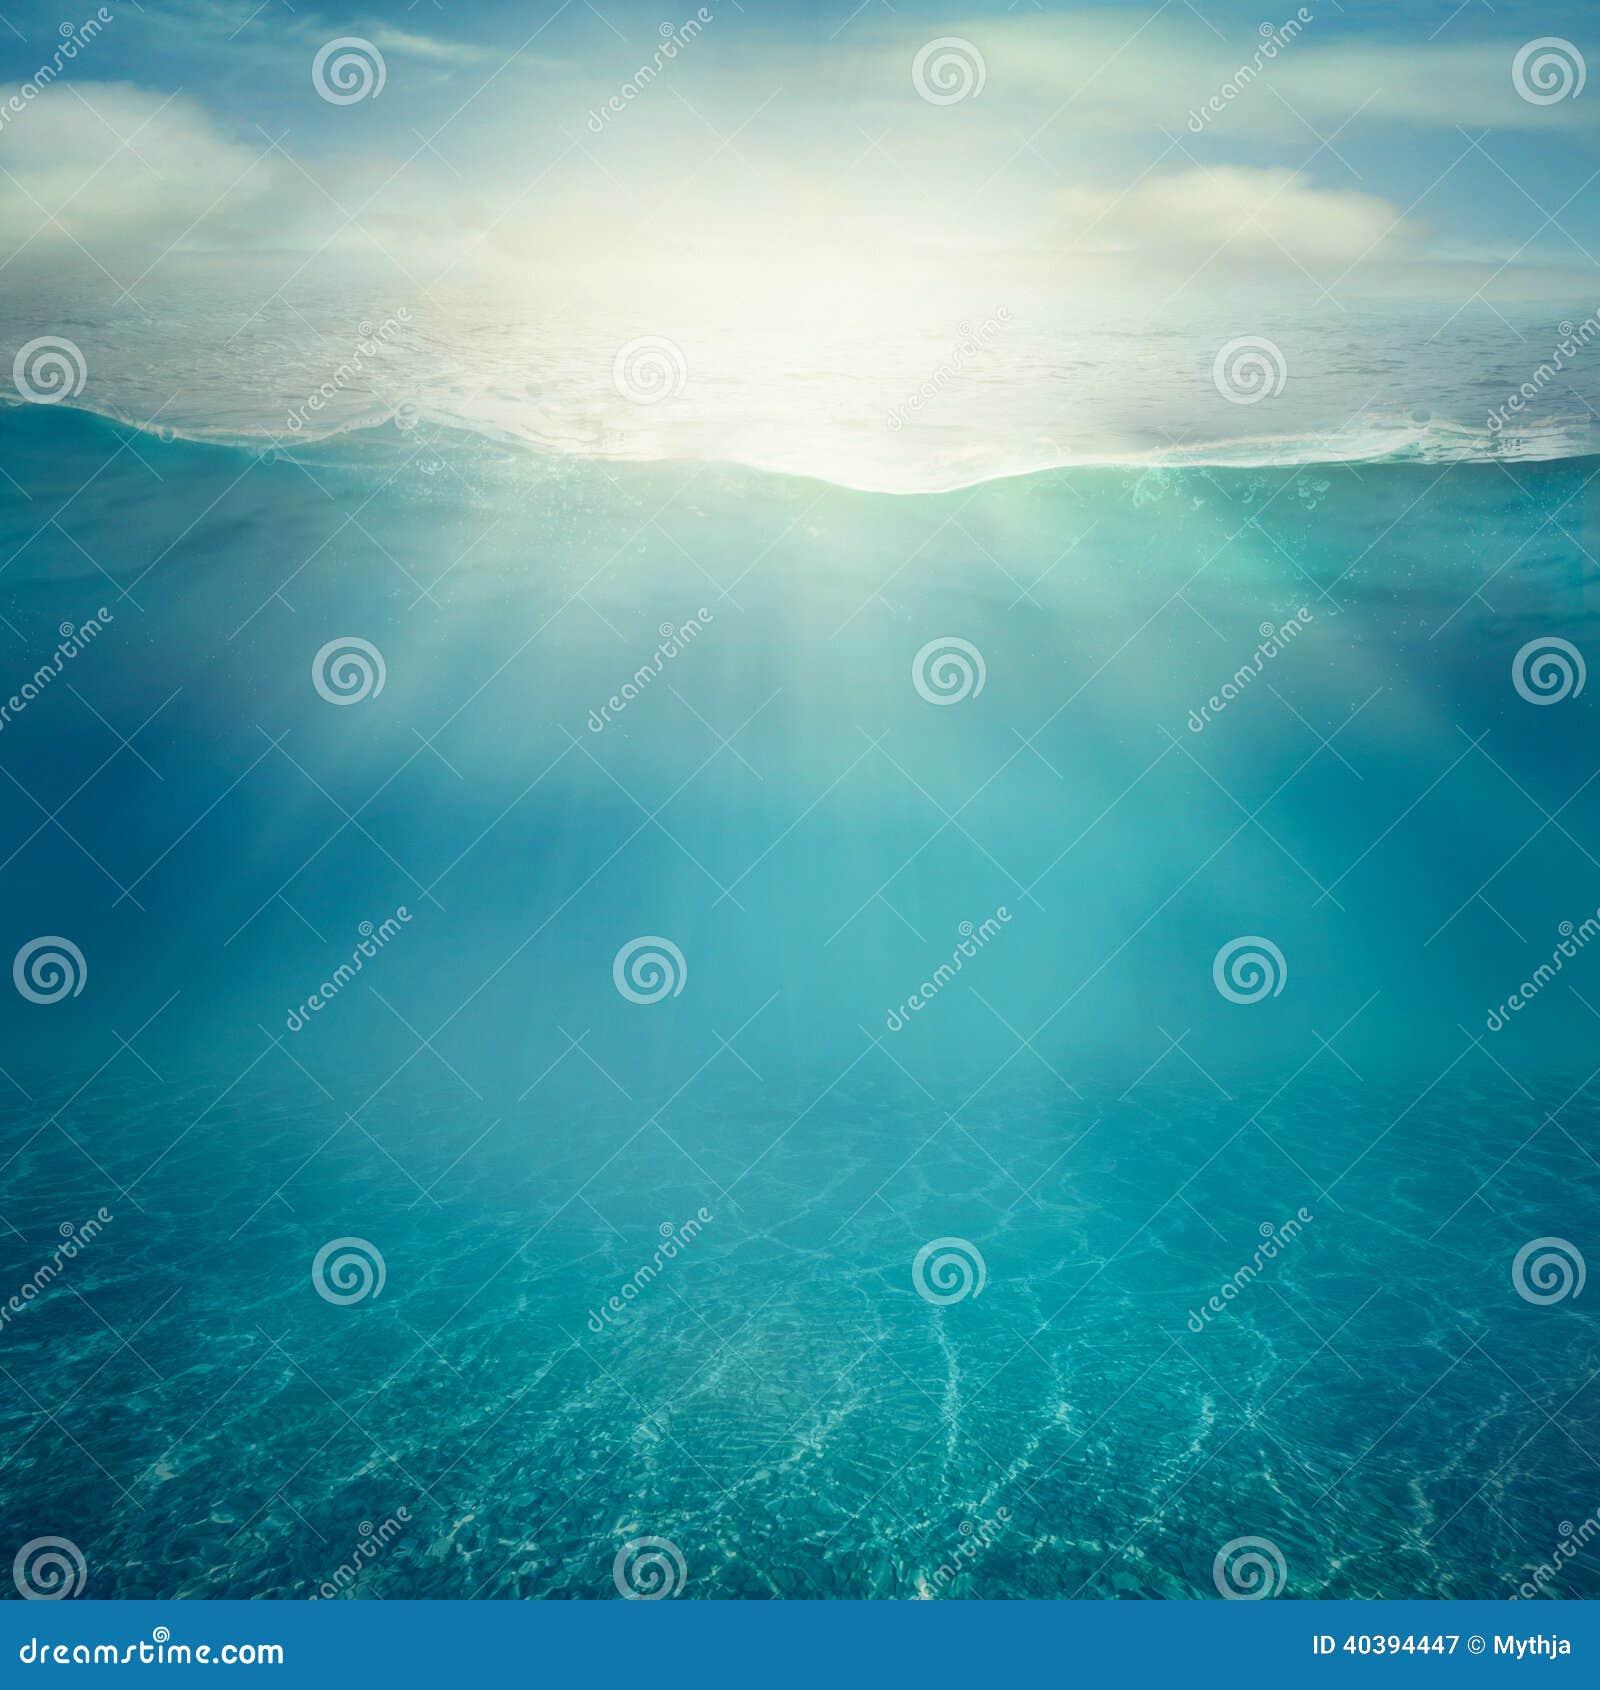 Underwater Background Stock Photo Image 40394447